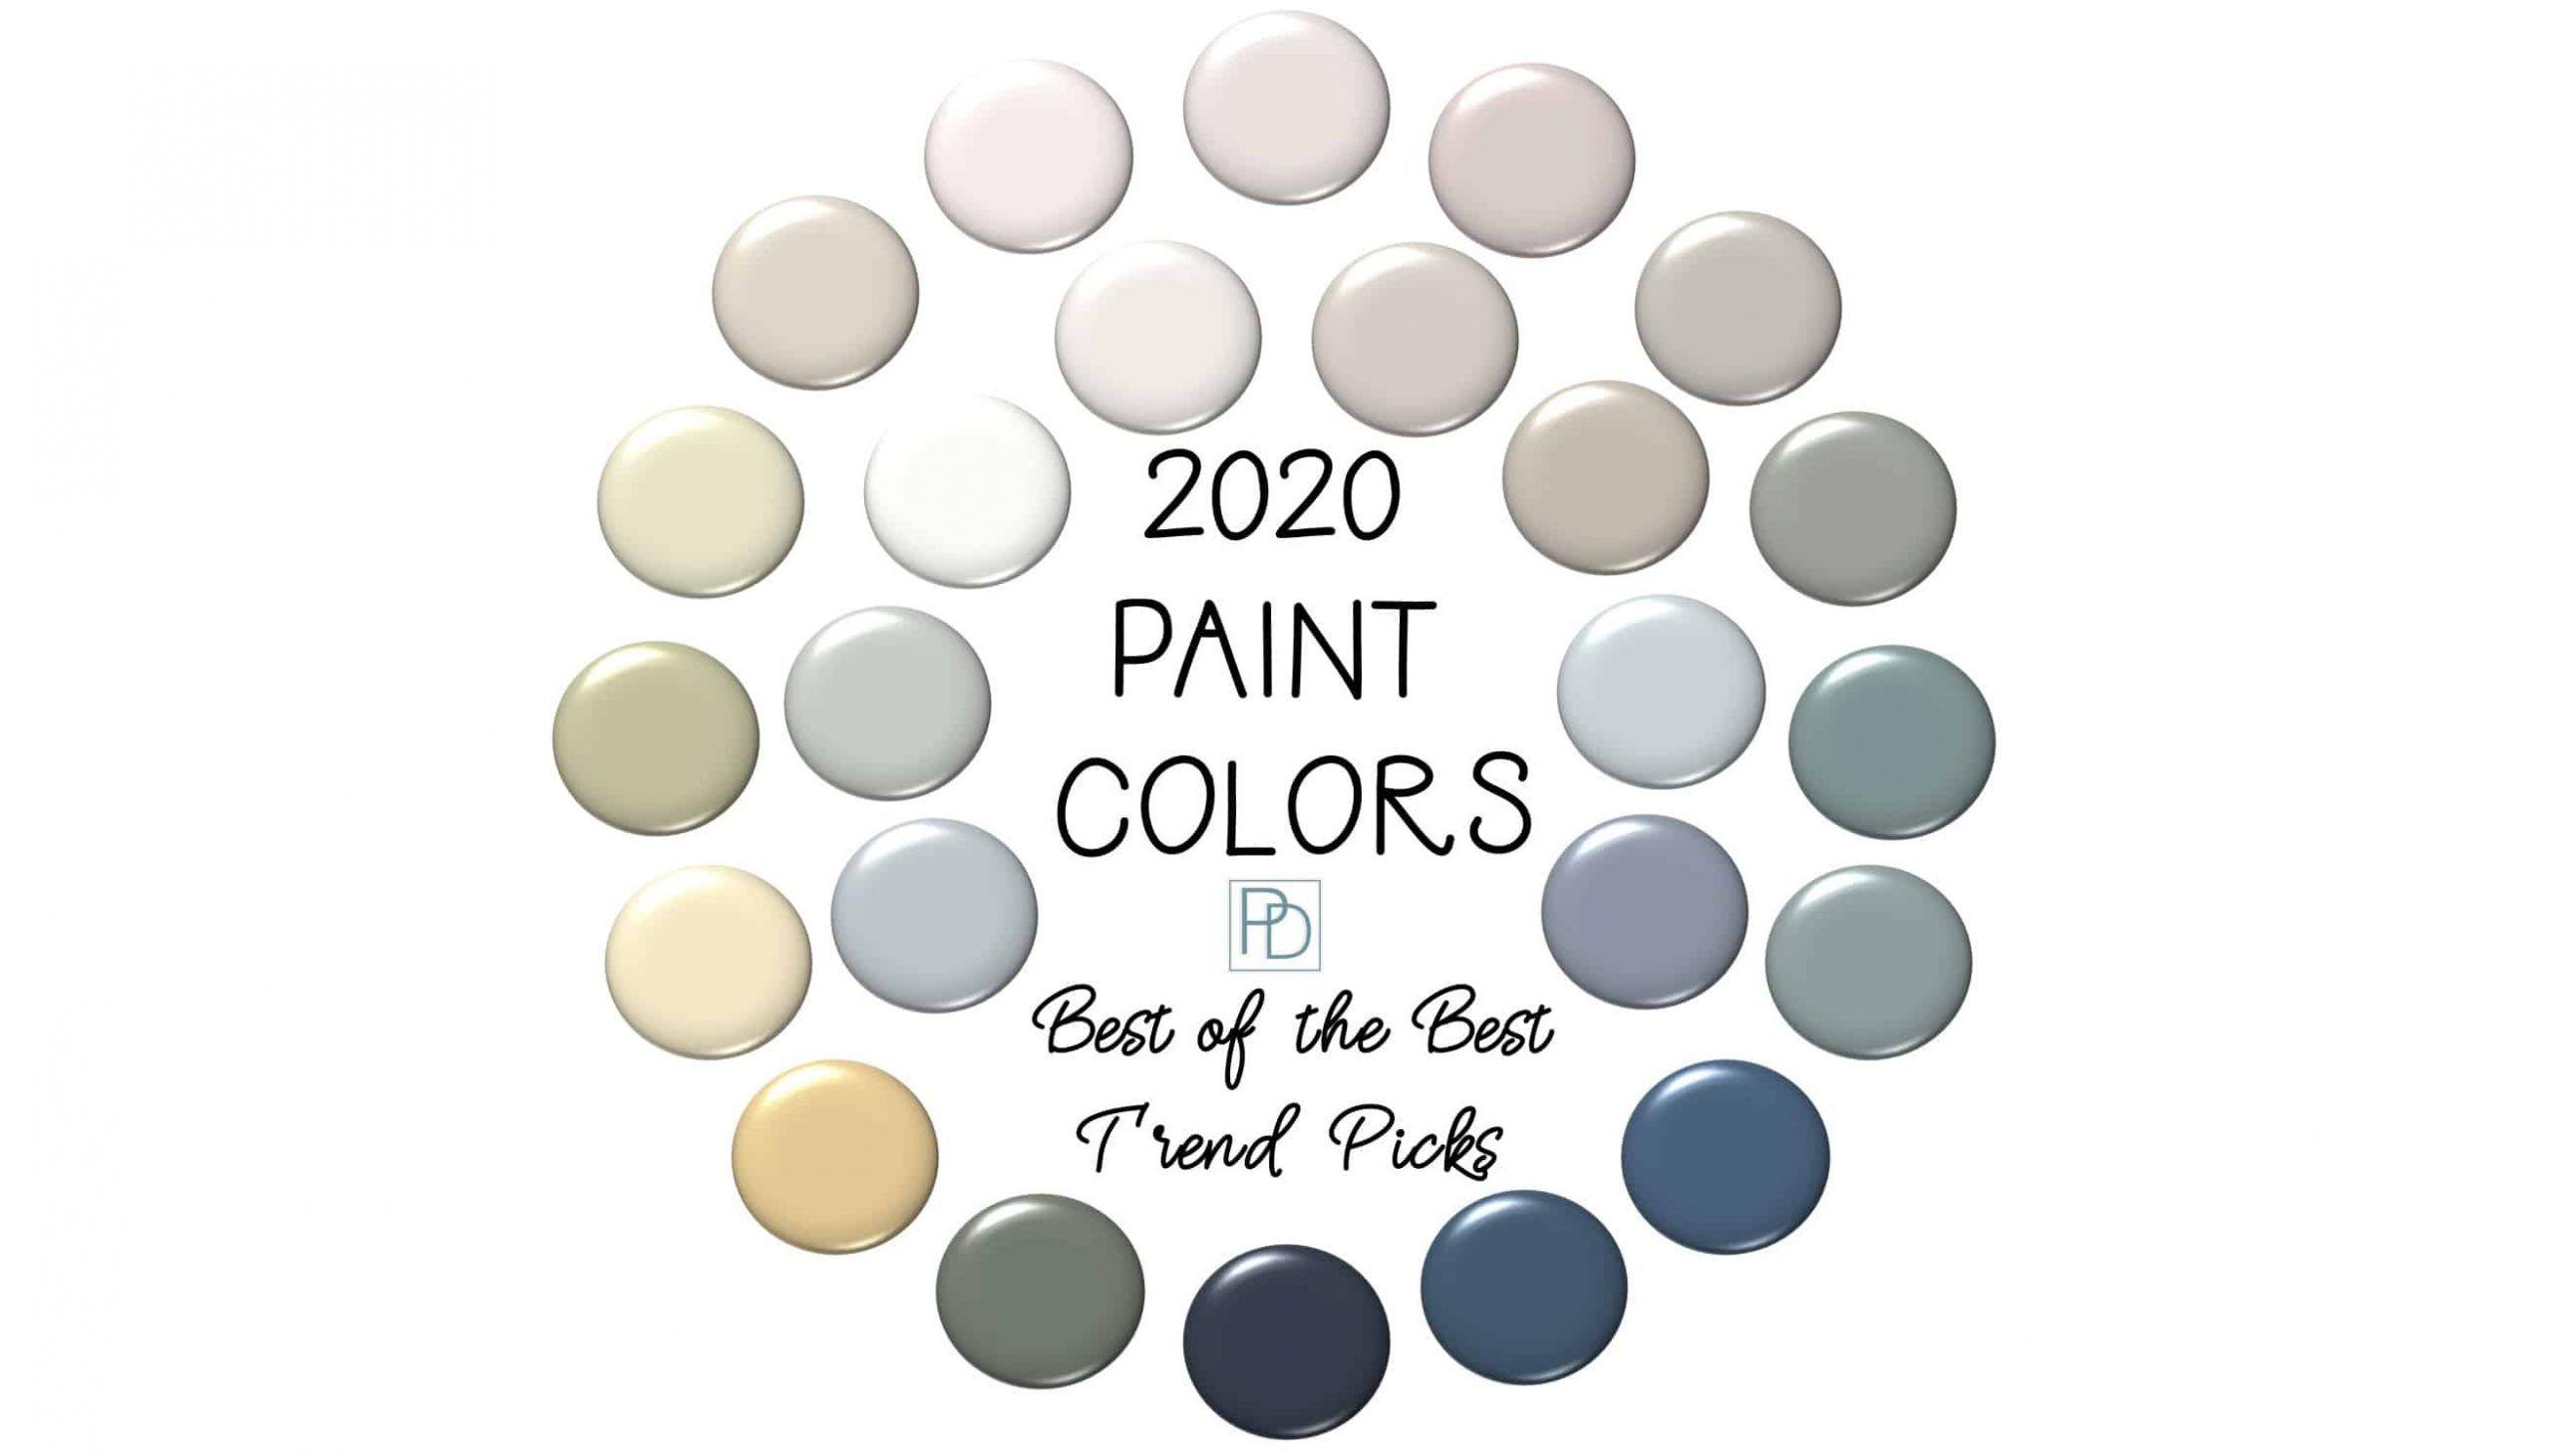 2020 Paint Color Trends: 24 Best of the Best Picks ...